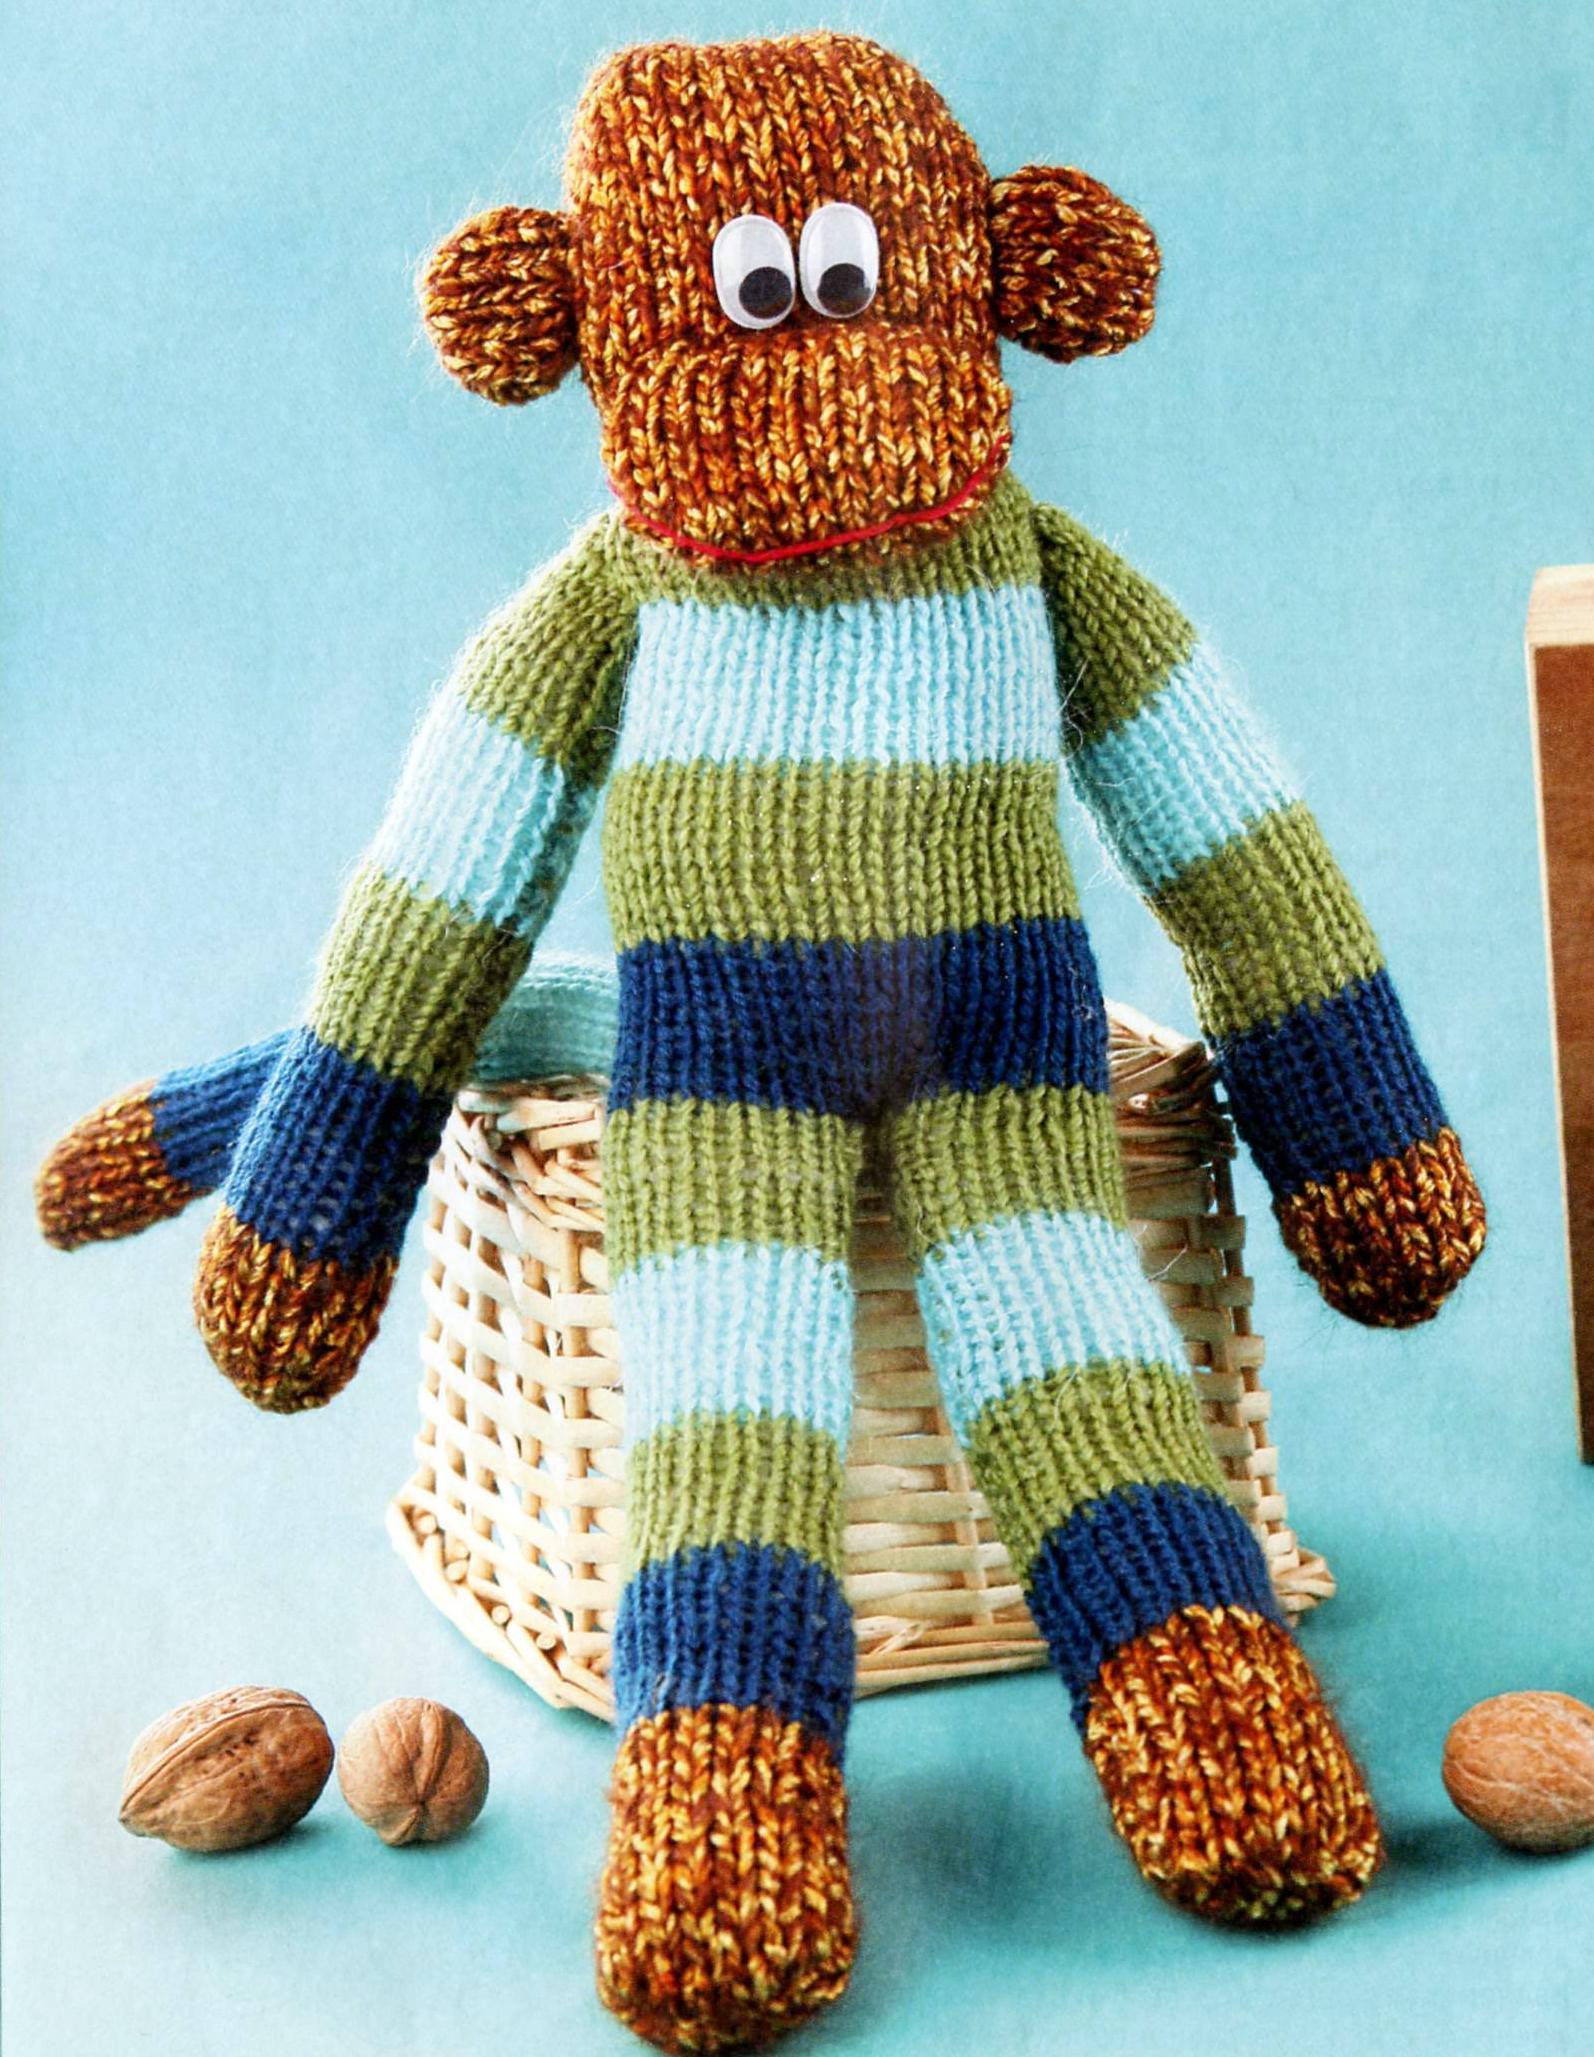 Забавная игрушечная обезьянка вязаная спицами